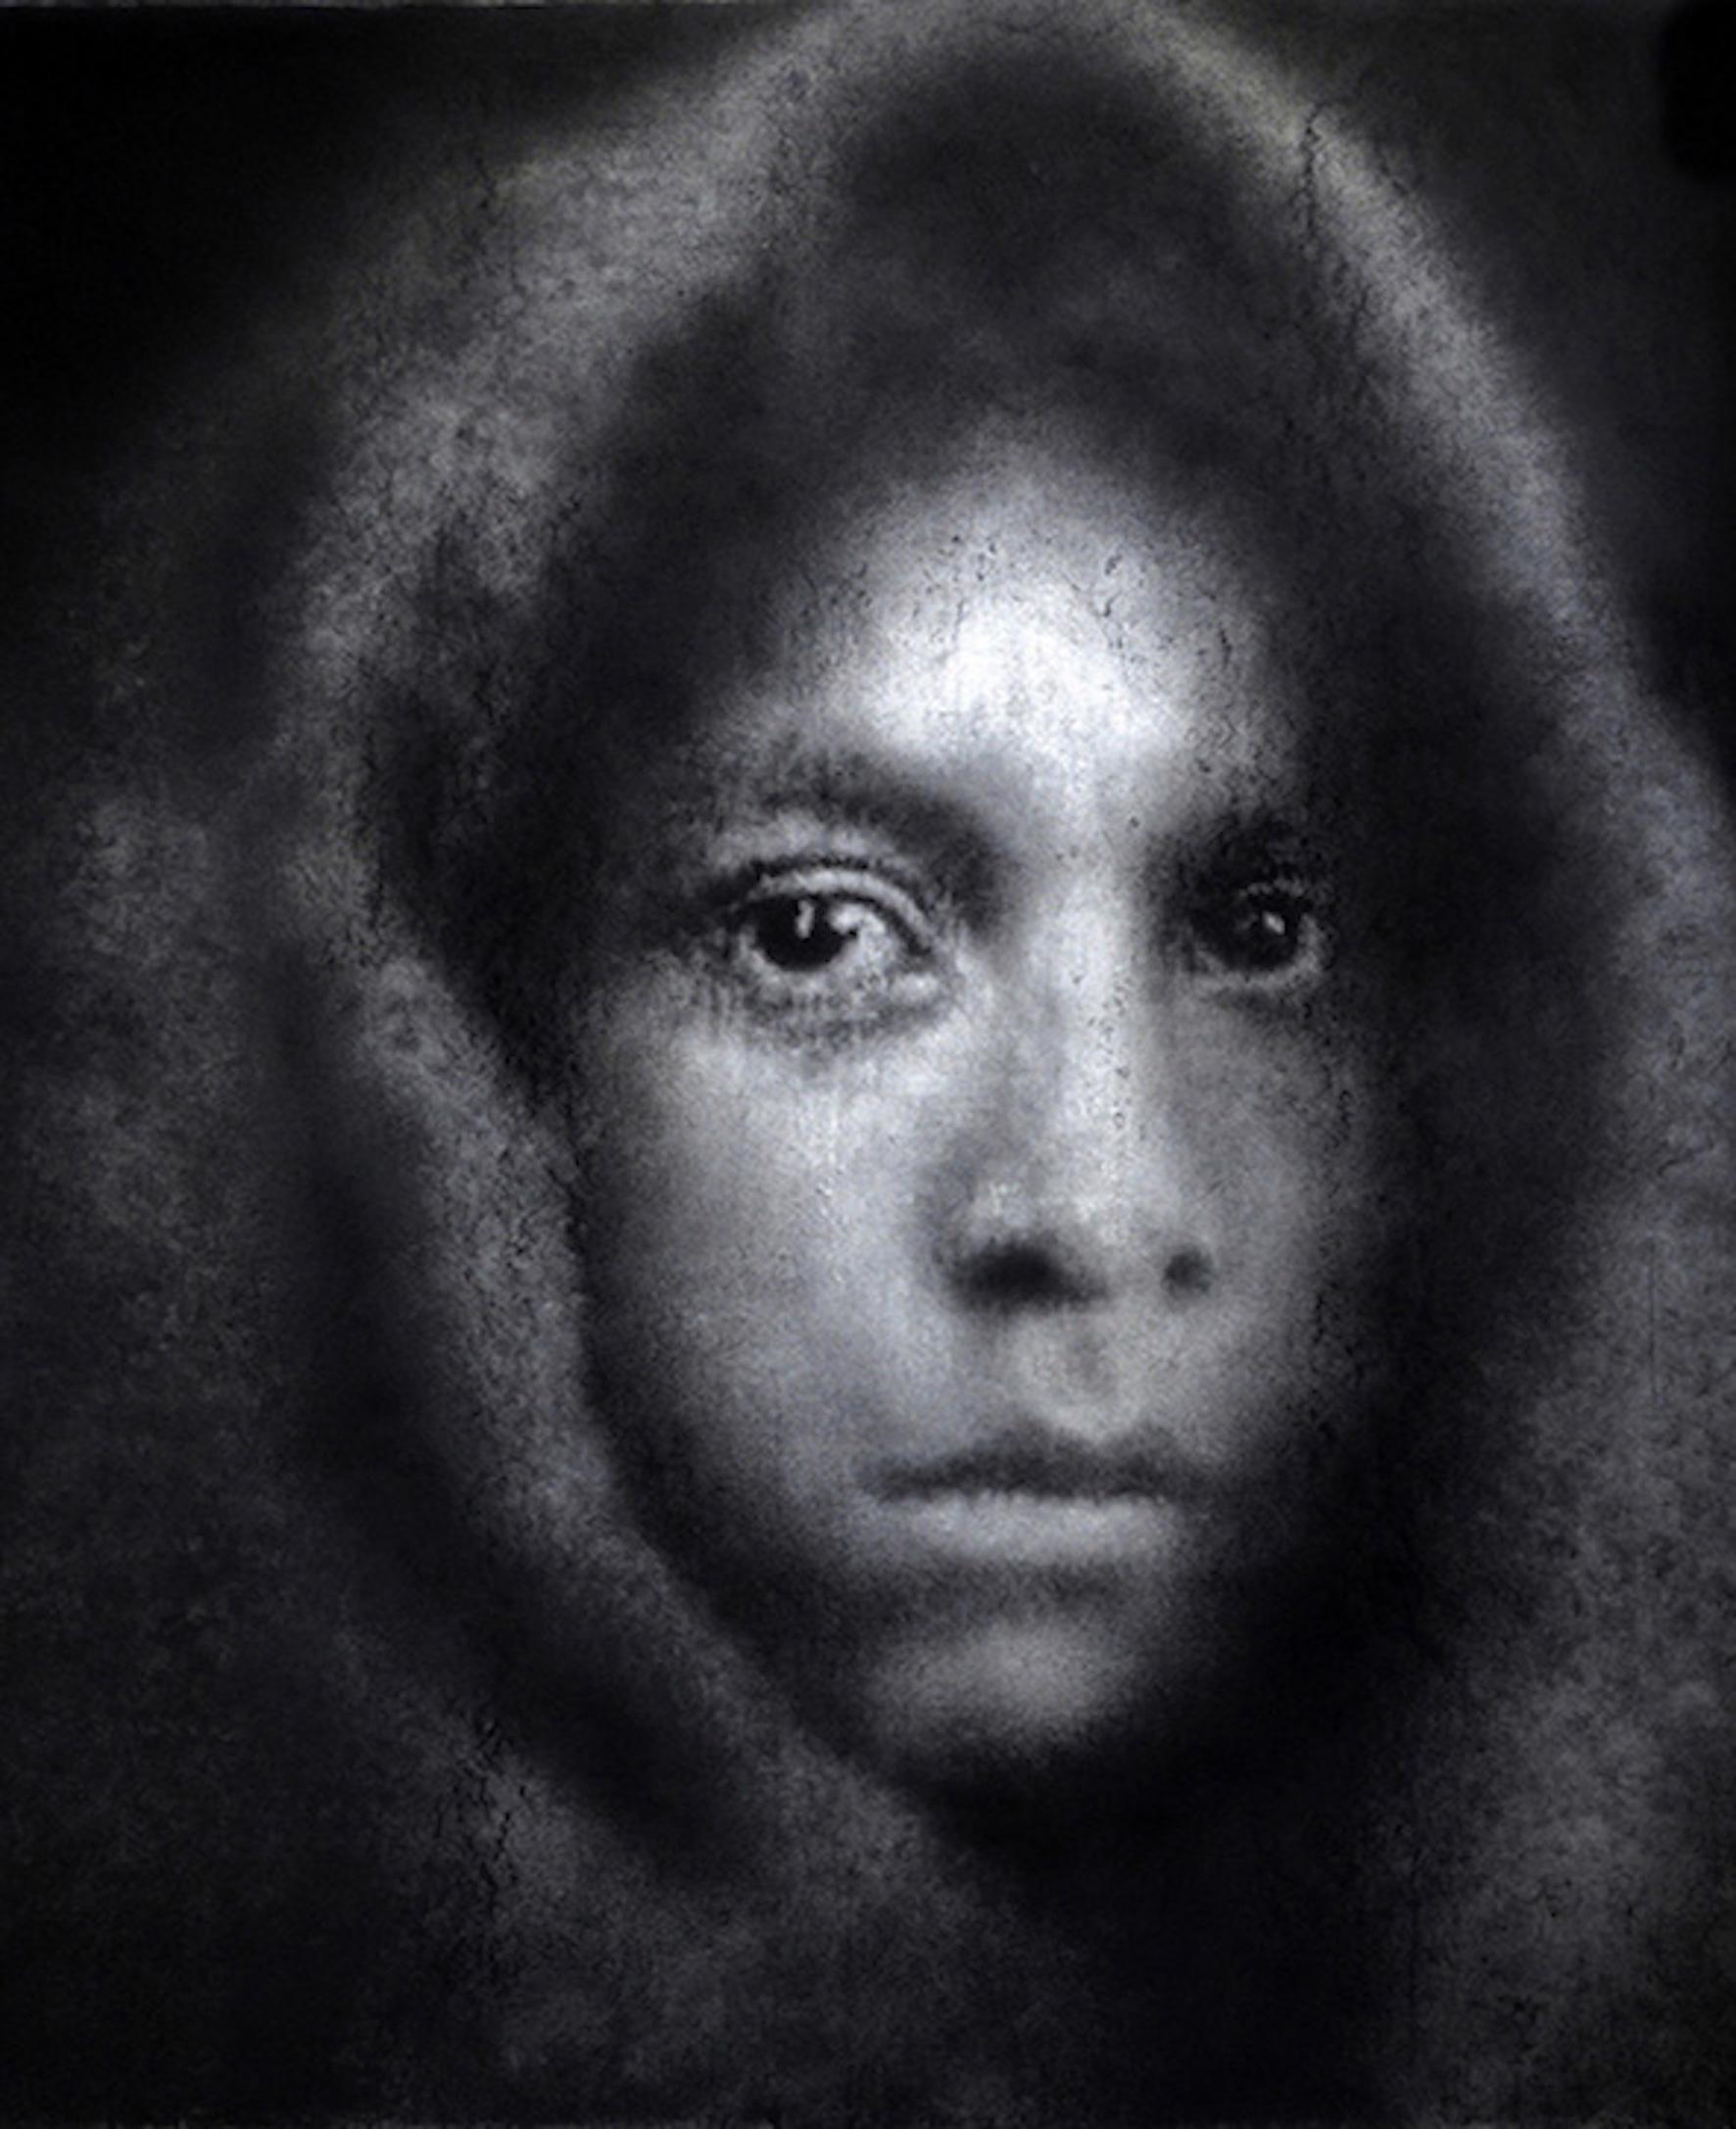 'Native American Girl, 19th Century' Caroline Burraway Charcoal, 150cm x 125cm